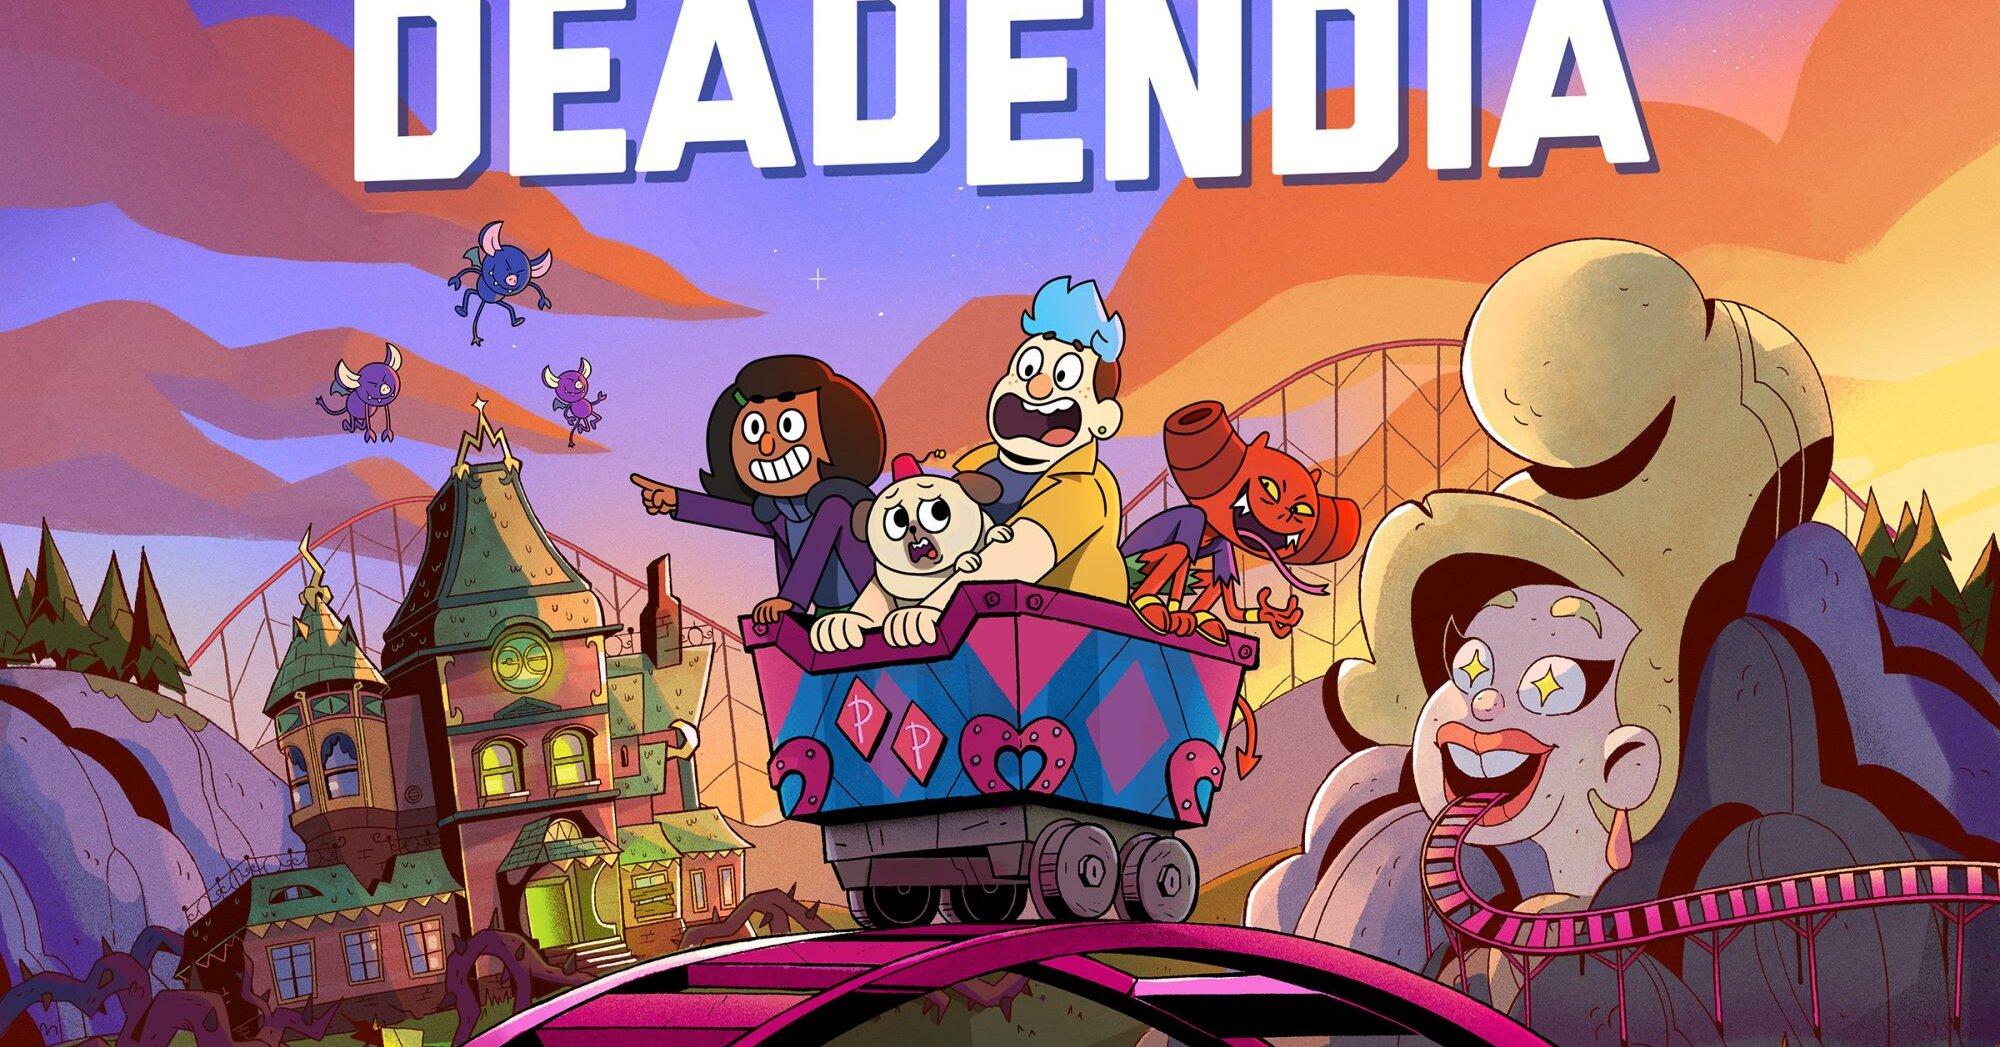 Netflix orders queer-friendly 'DeadEndia' animated kids series with 'Beetlejuice' musical star